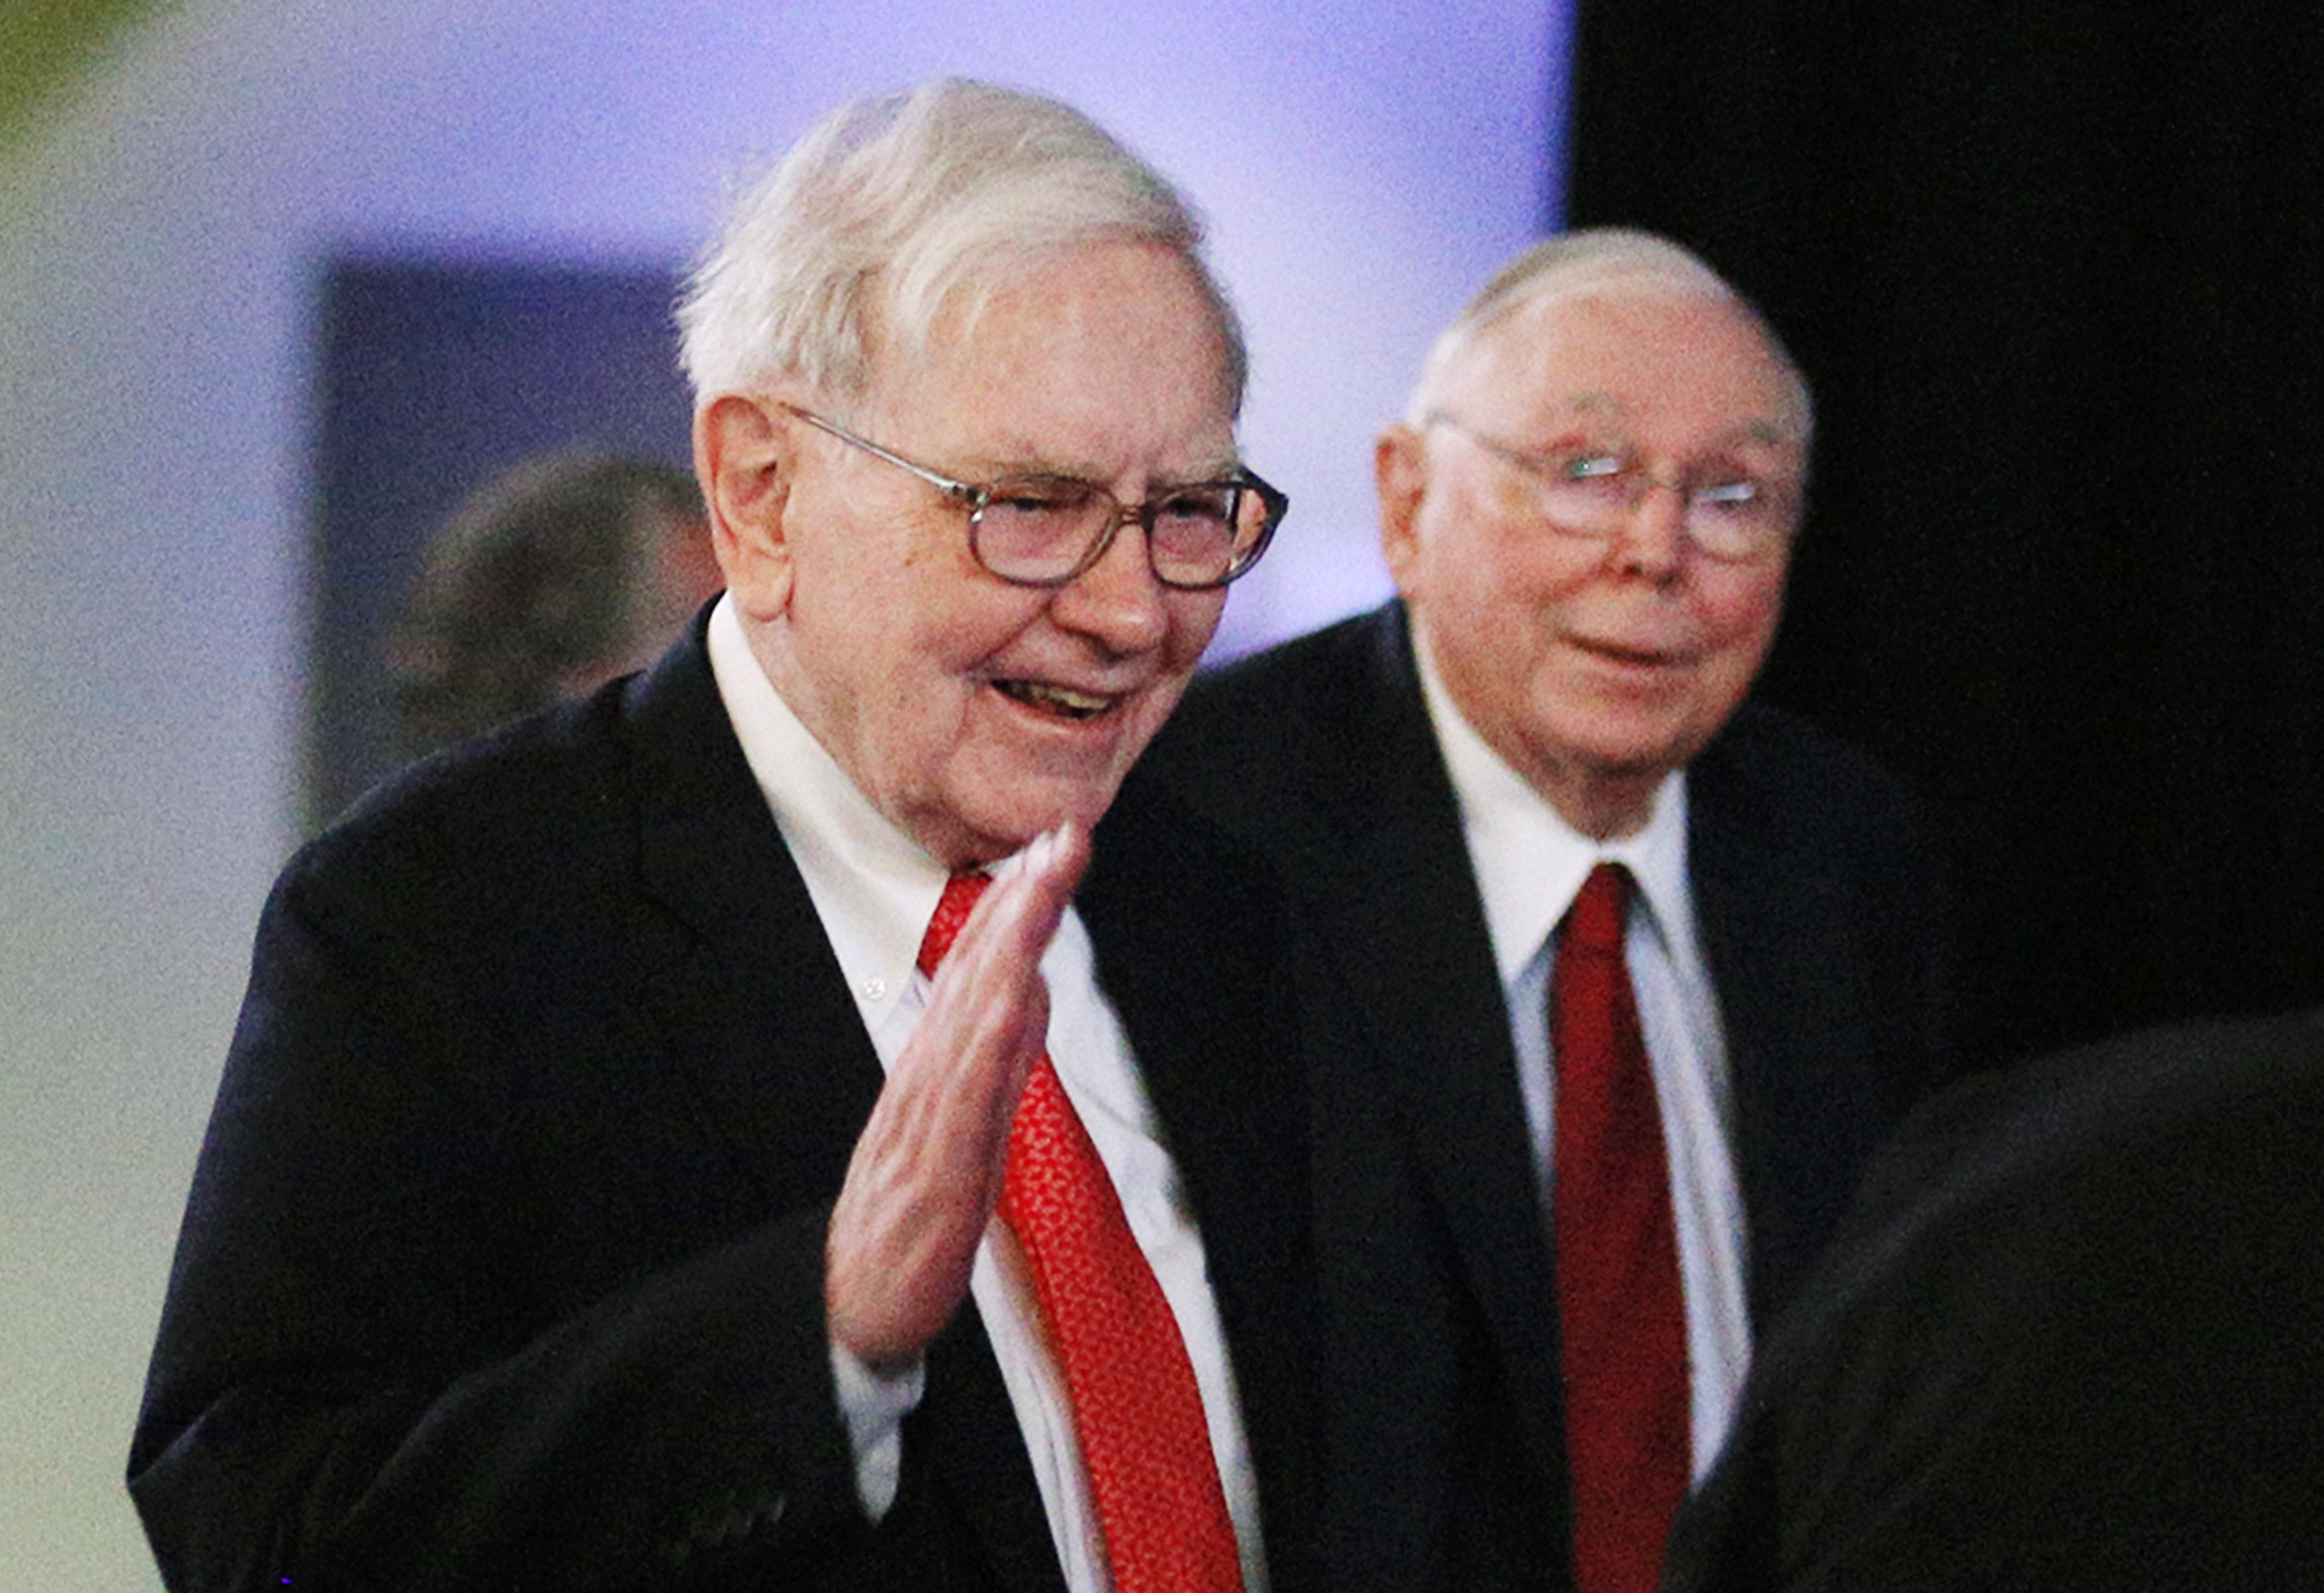 Berkshire Hathaway keeps people guessing on successor